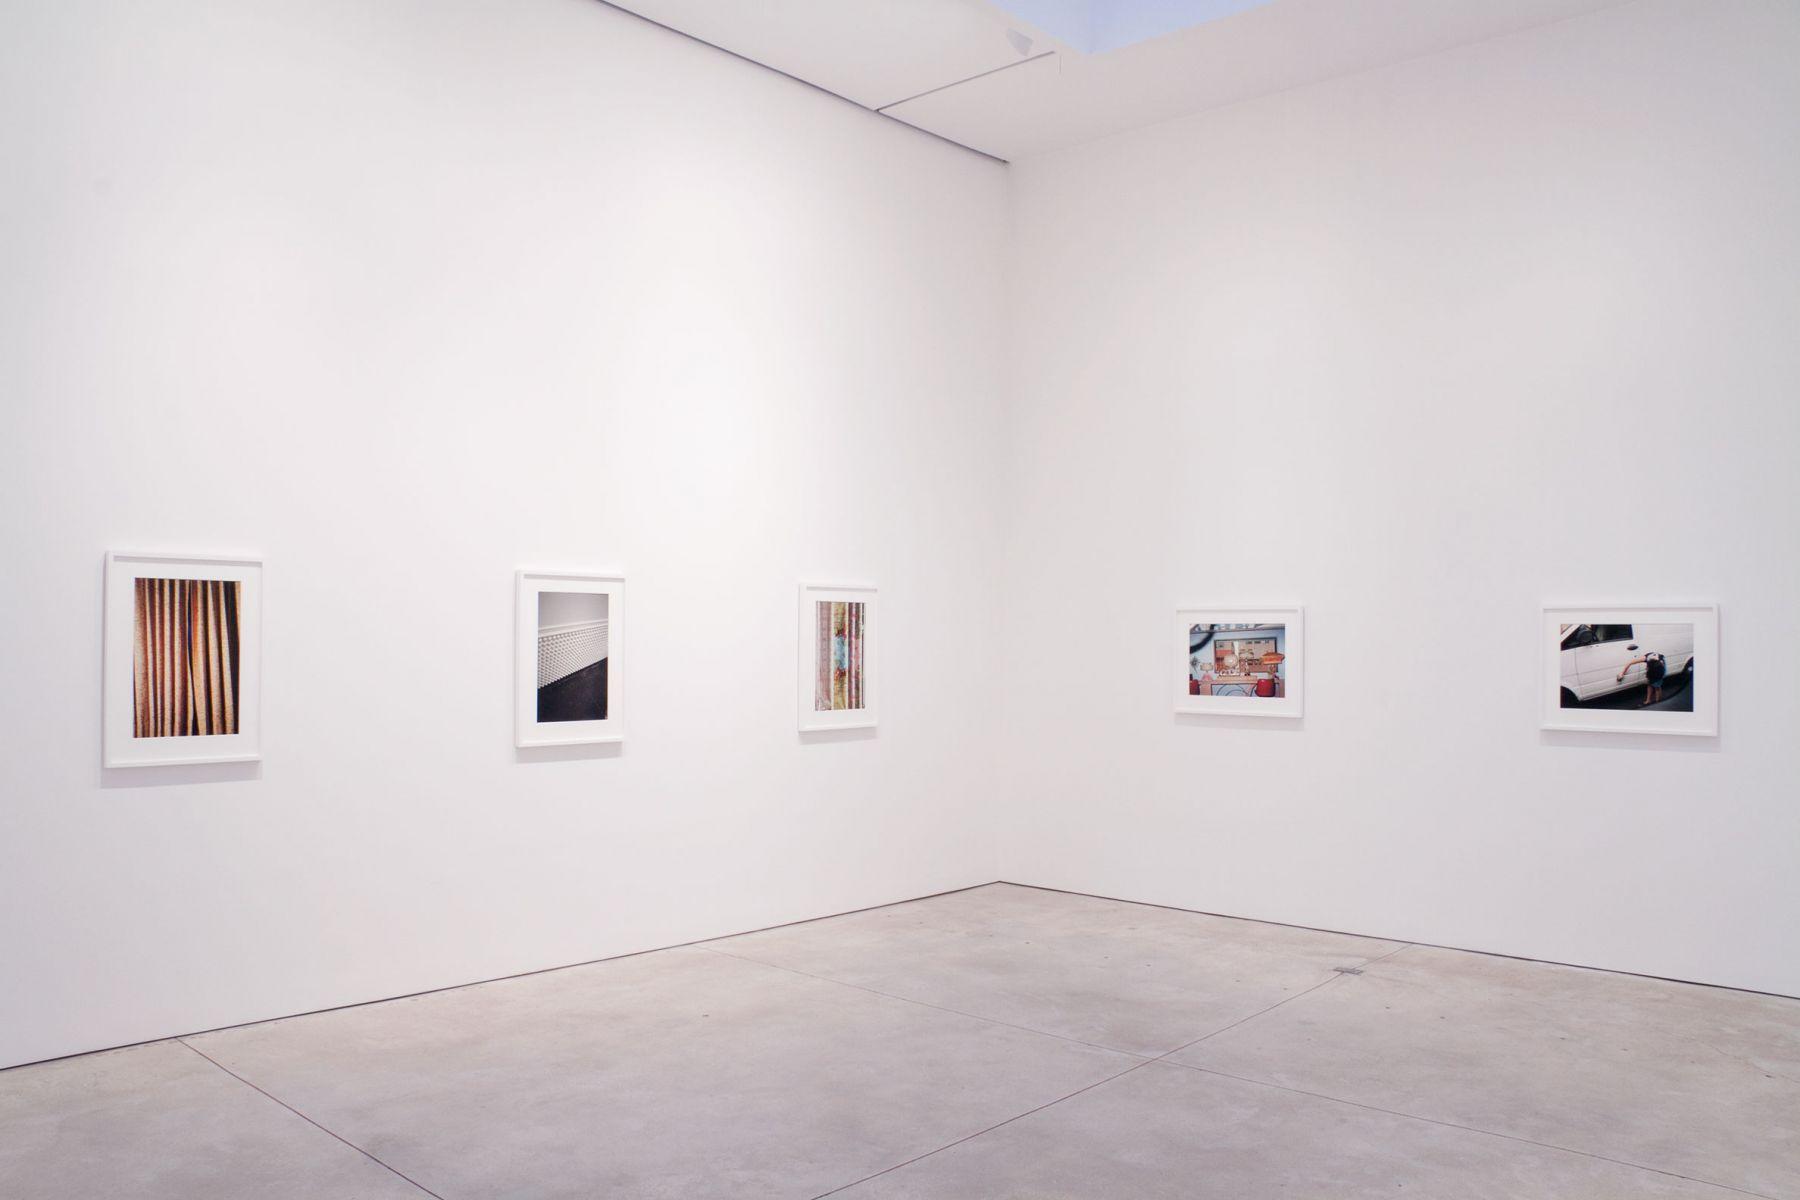 William Eggleston - Installation View